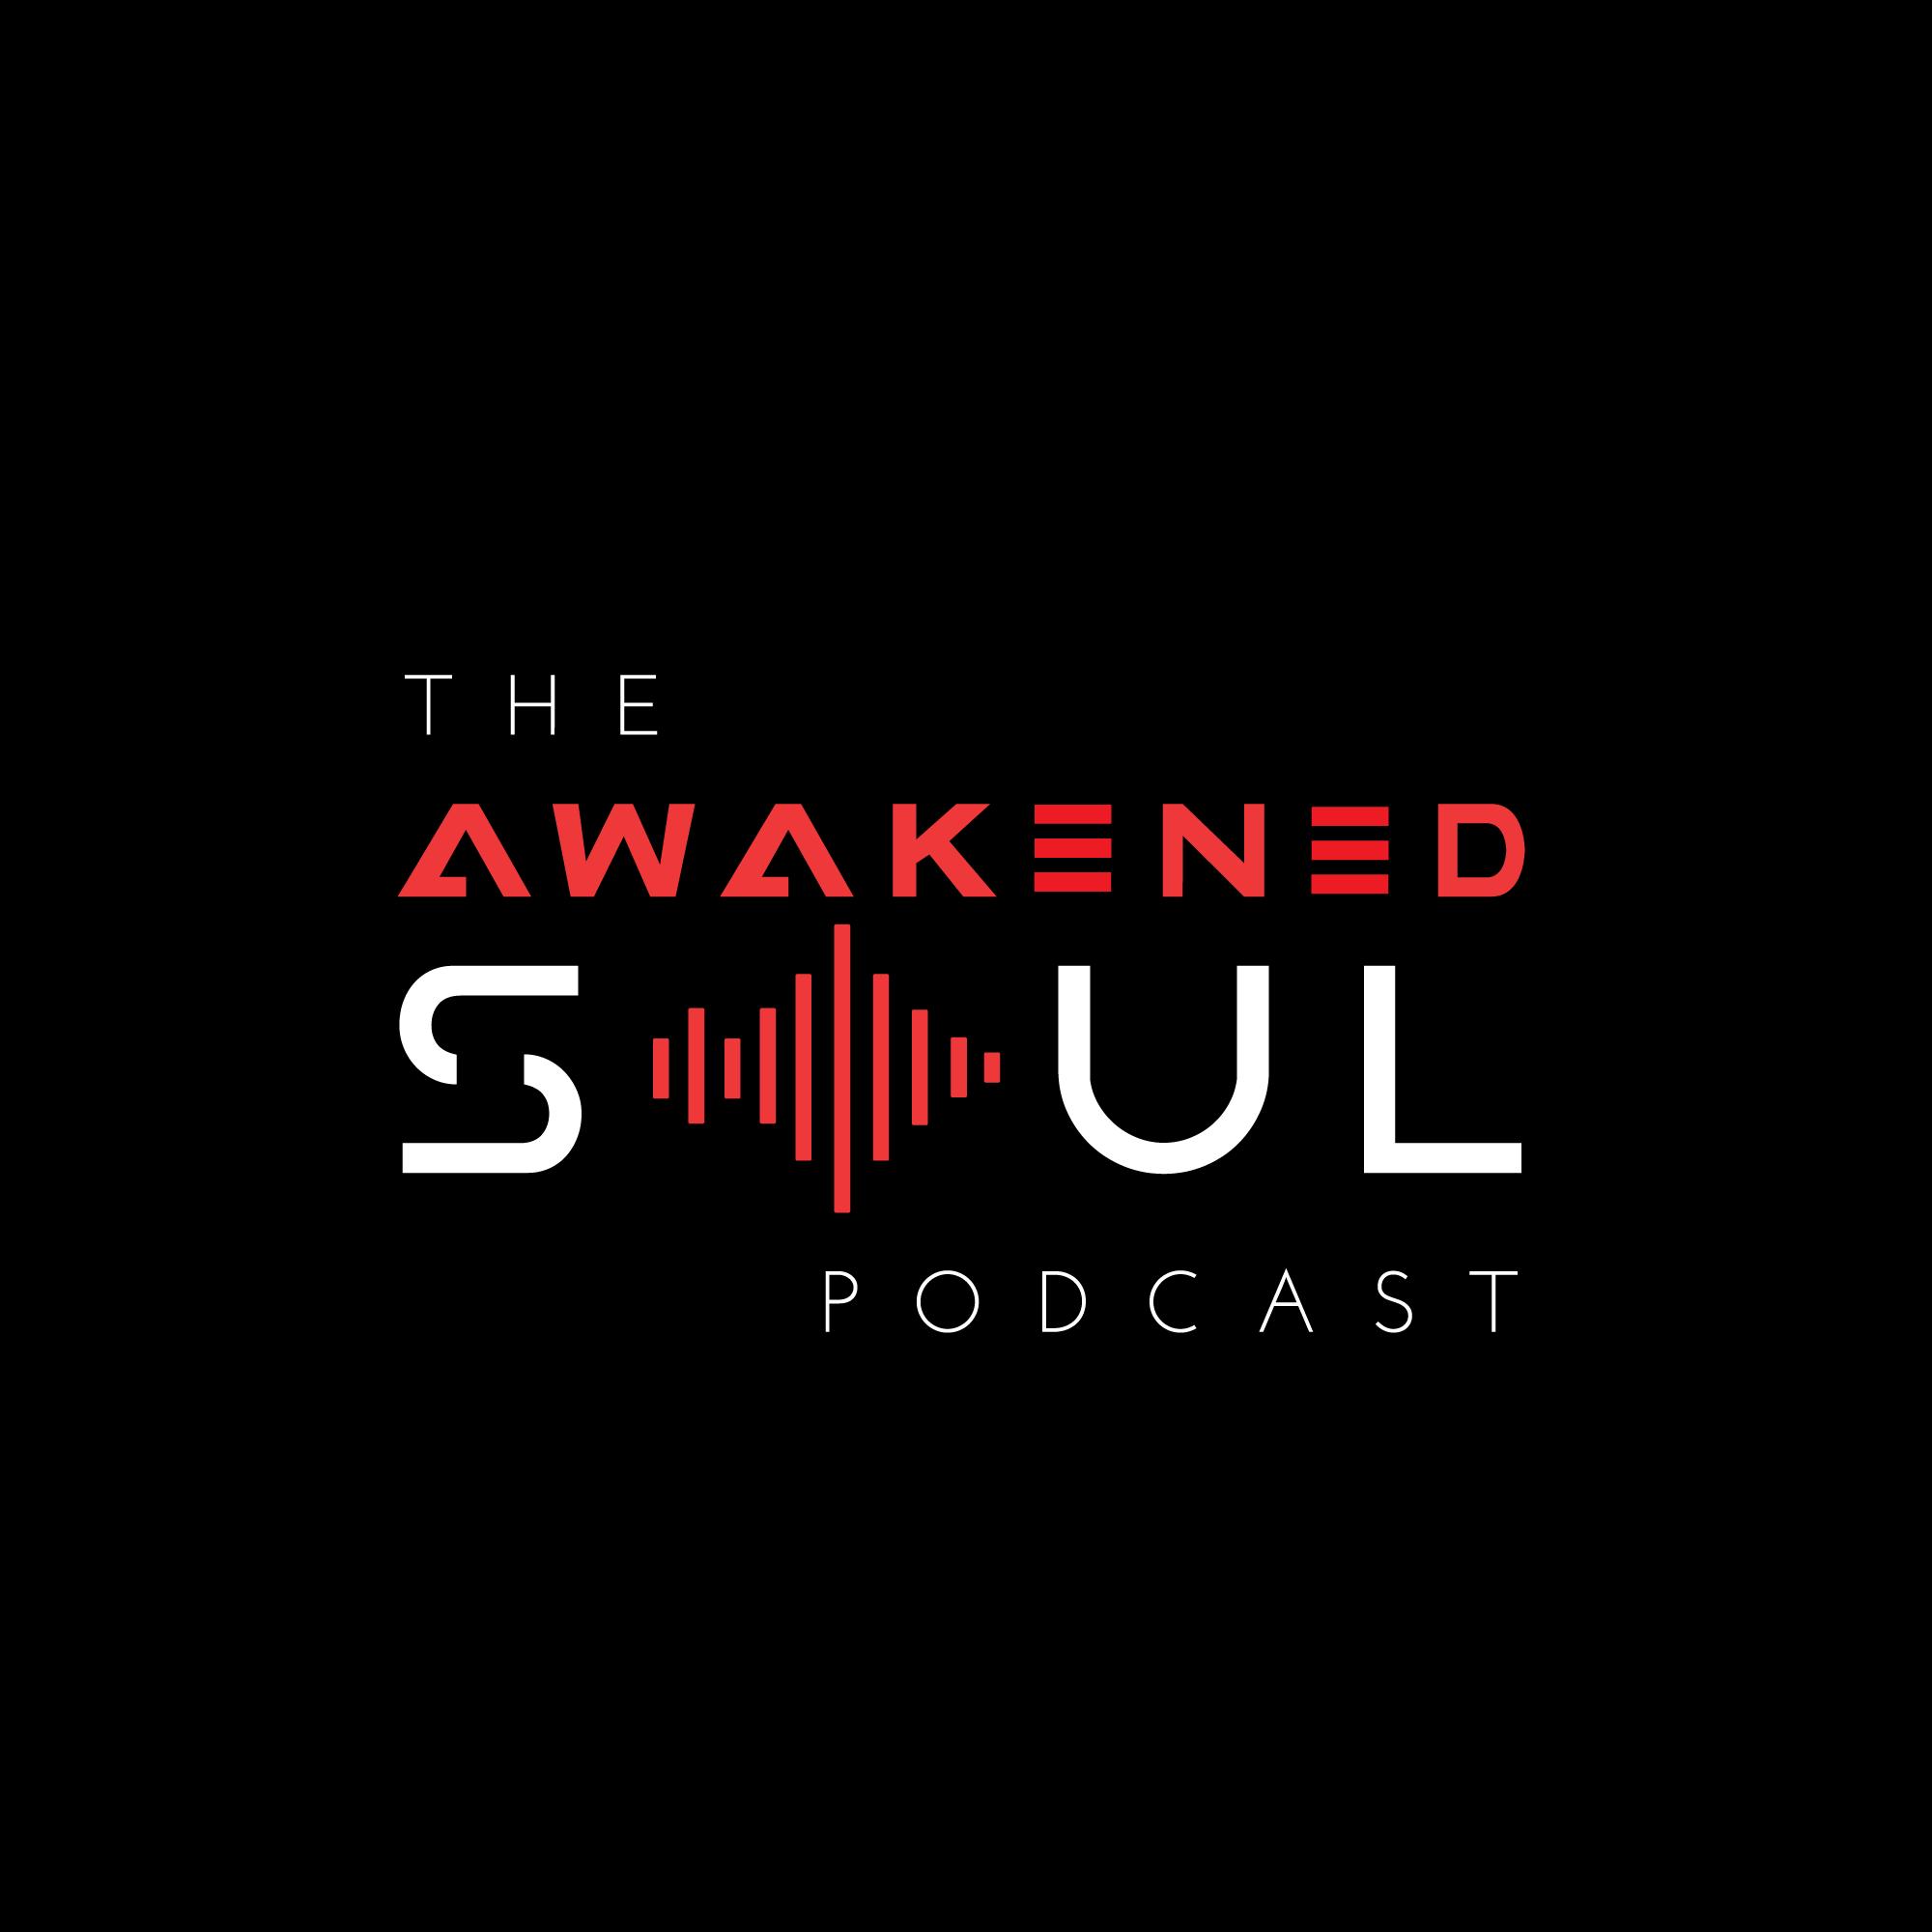 The Awakened Soul Podcast